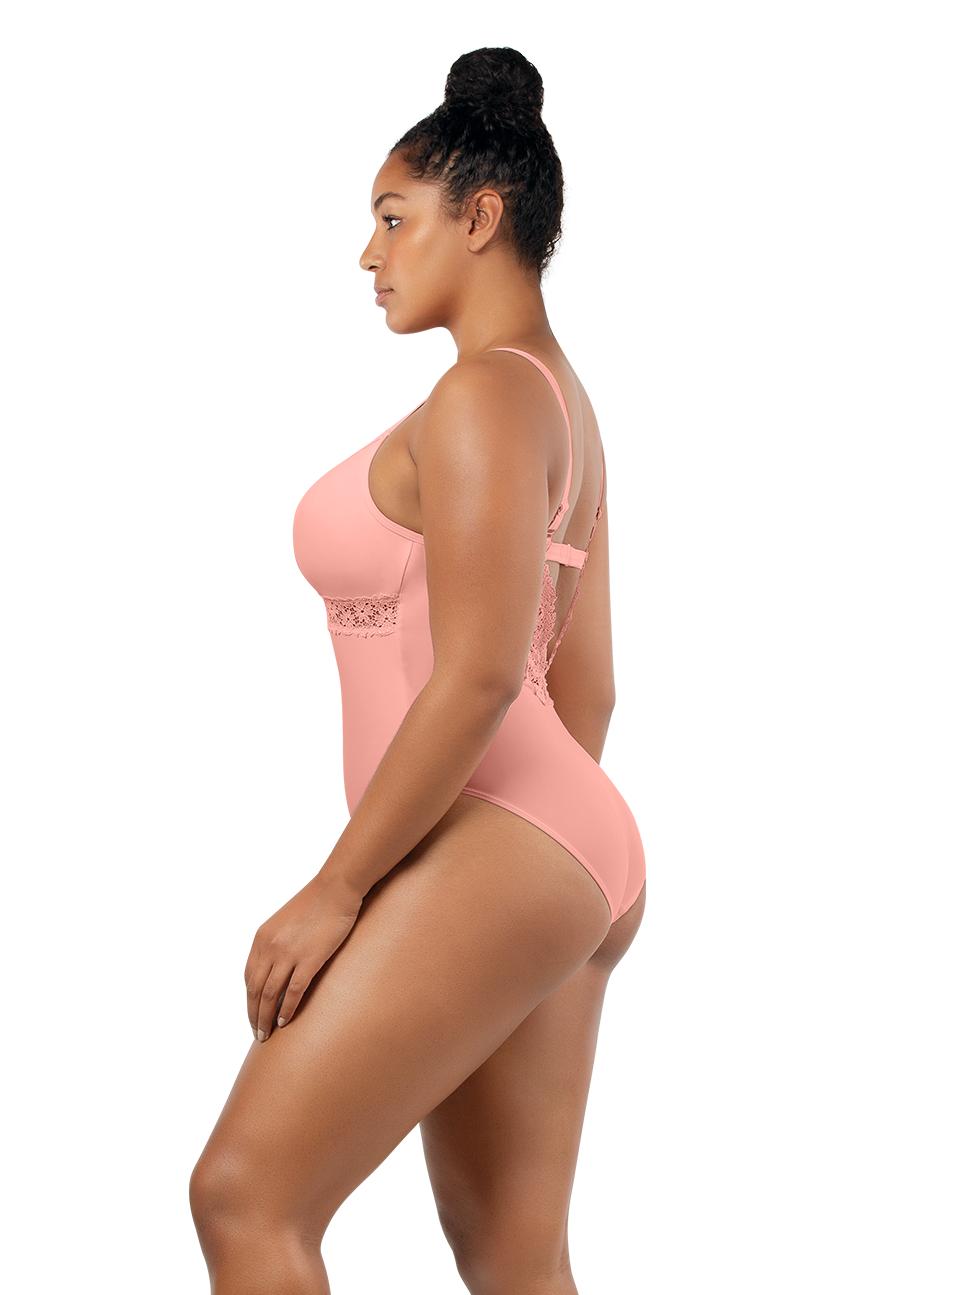 PARFAIT Brigitte OnePieceSwimsuitS8206 PeachBud Side2 - Brigitte One Piece Swimsuit Peach Bud S8206